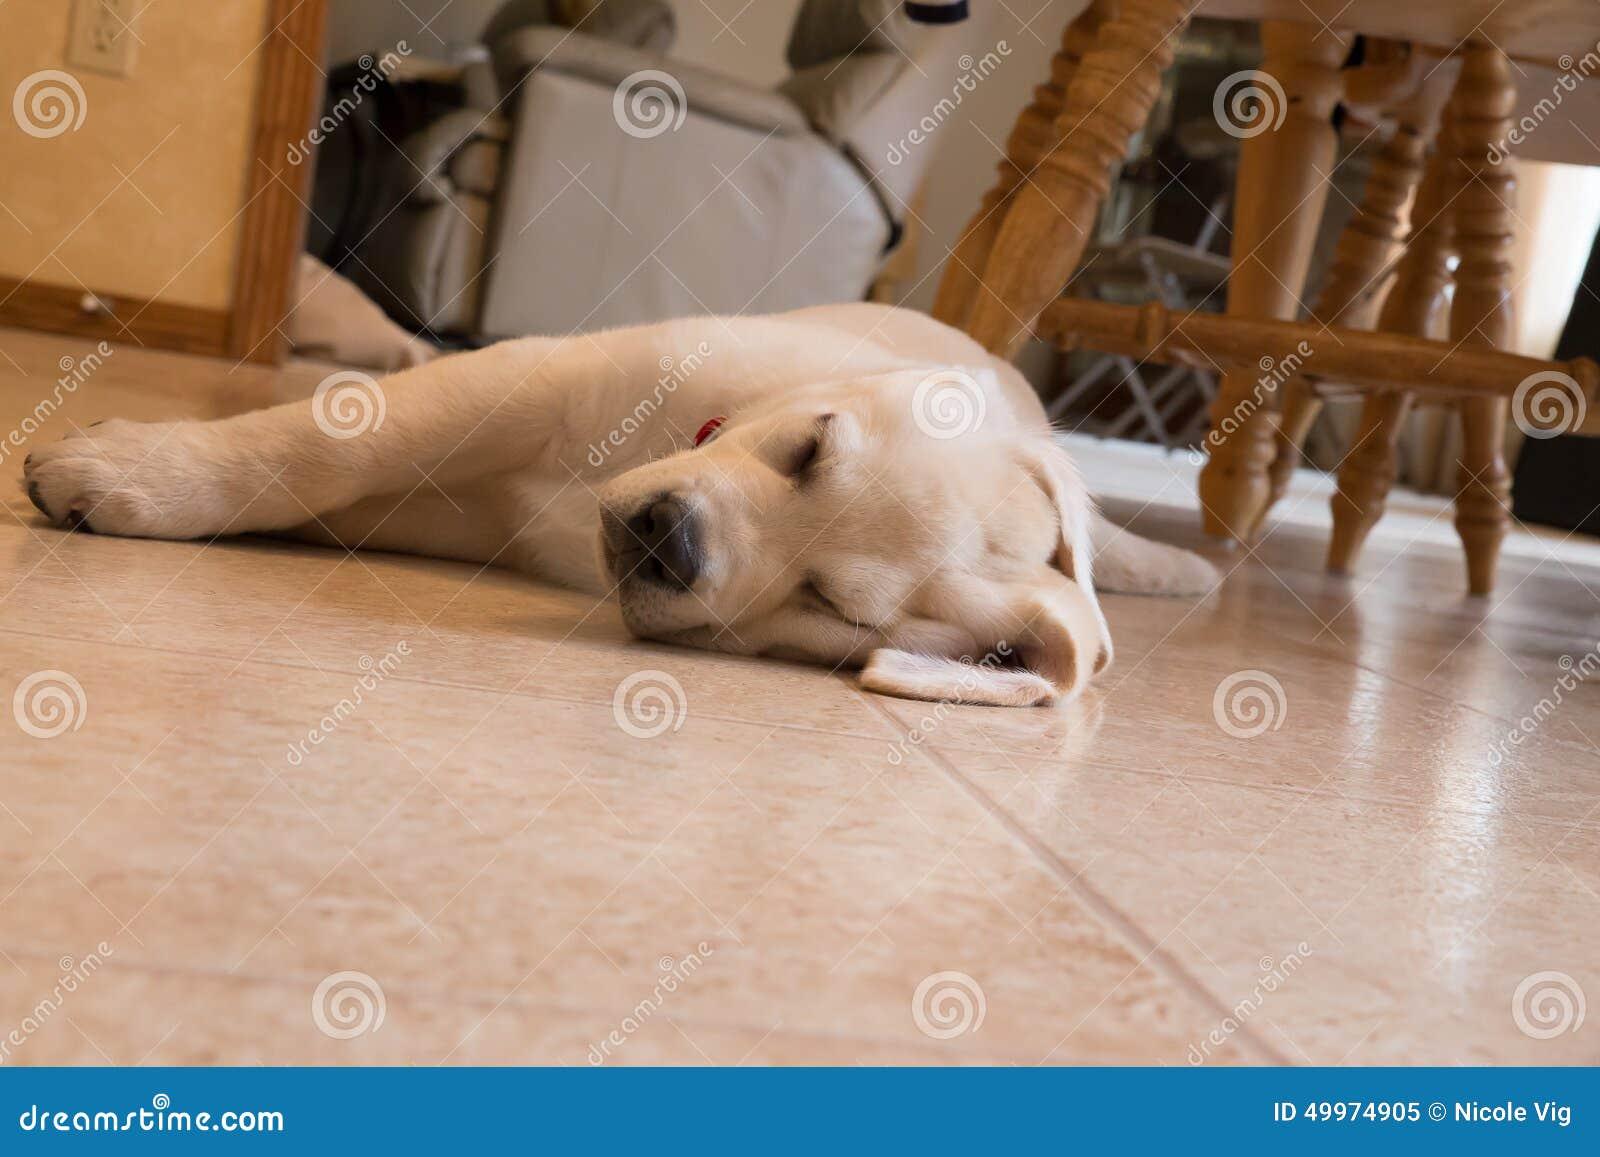 yellow lab puppy sleeping - photo #26